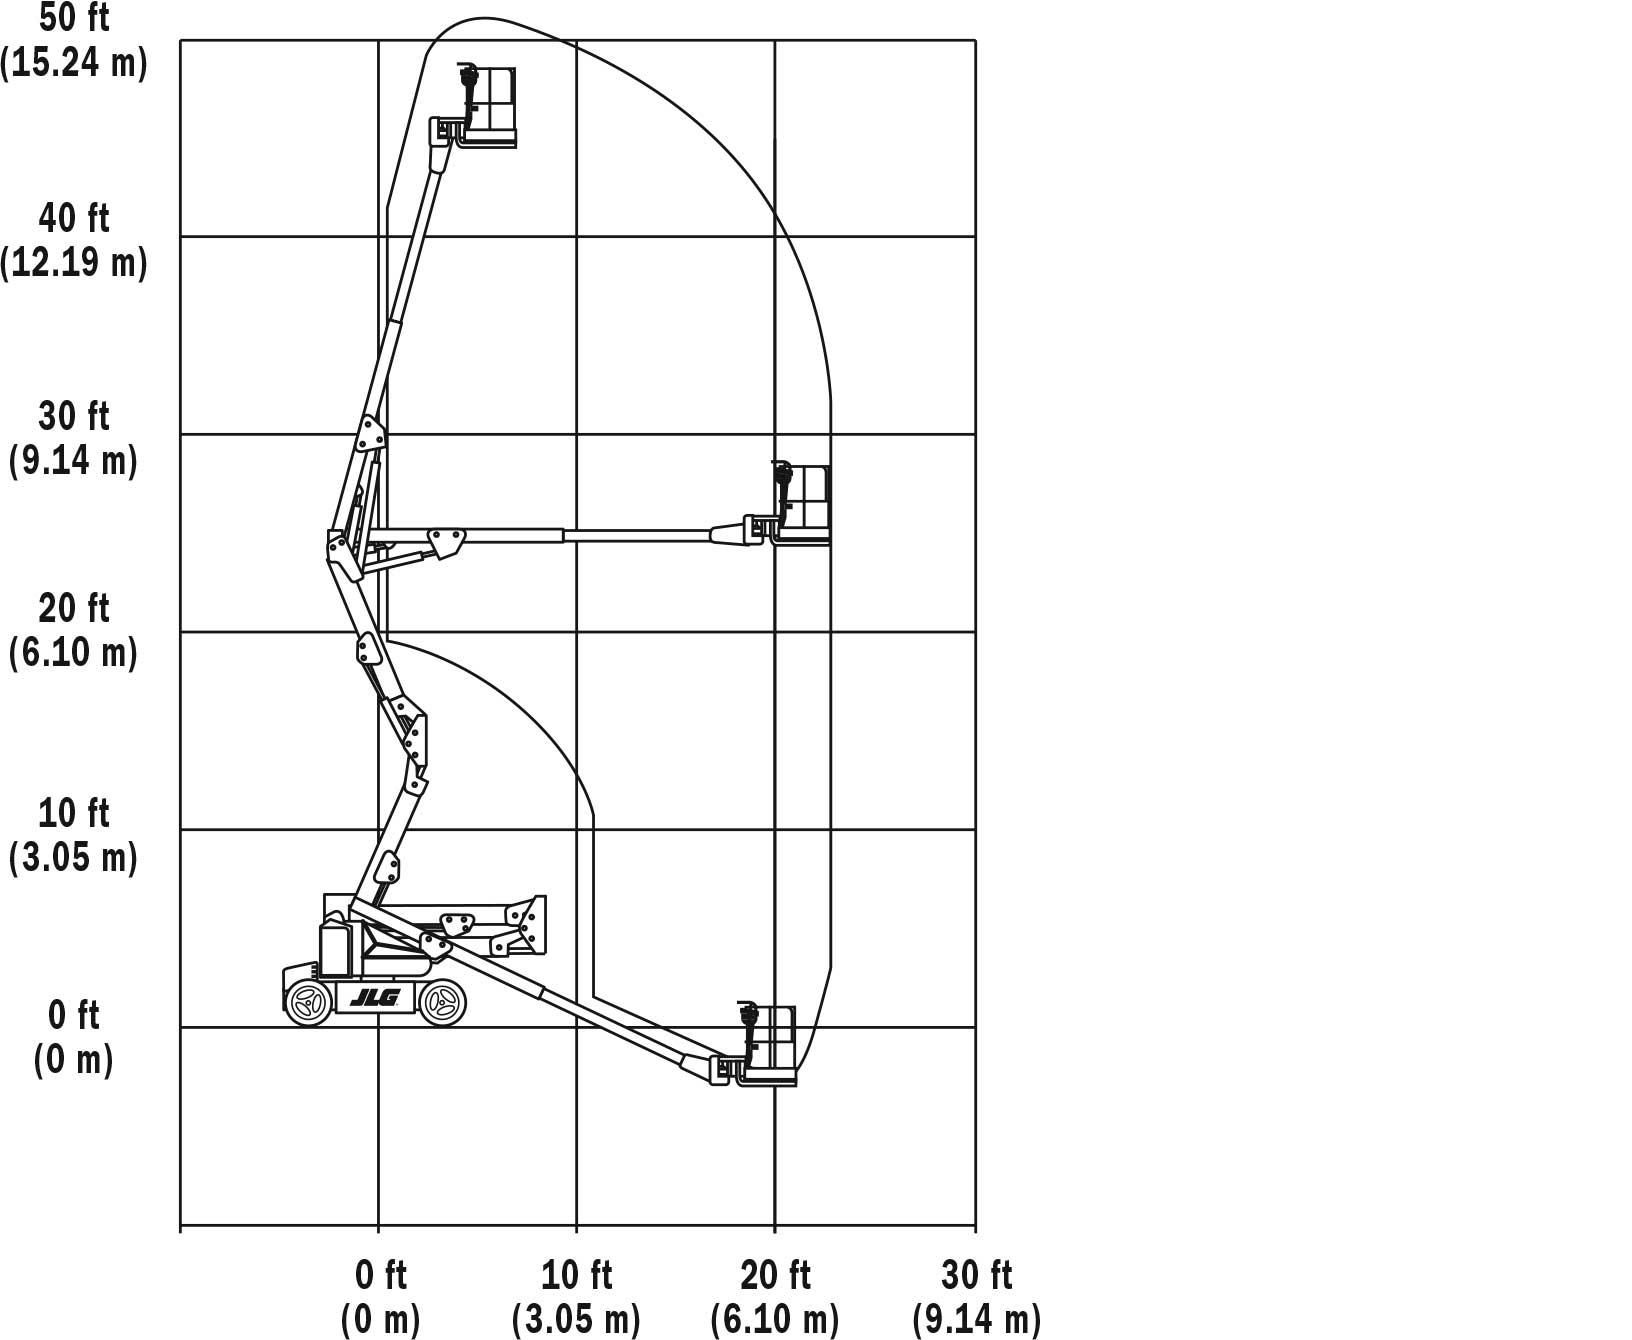 E450A电动曲臂式高空作业平台工作范围图